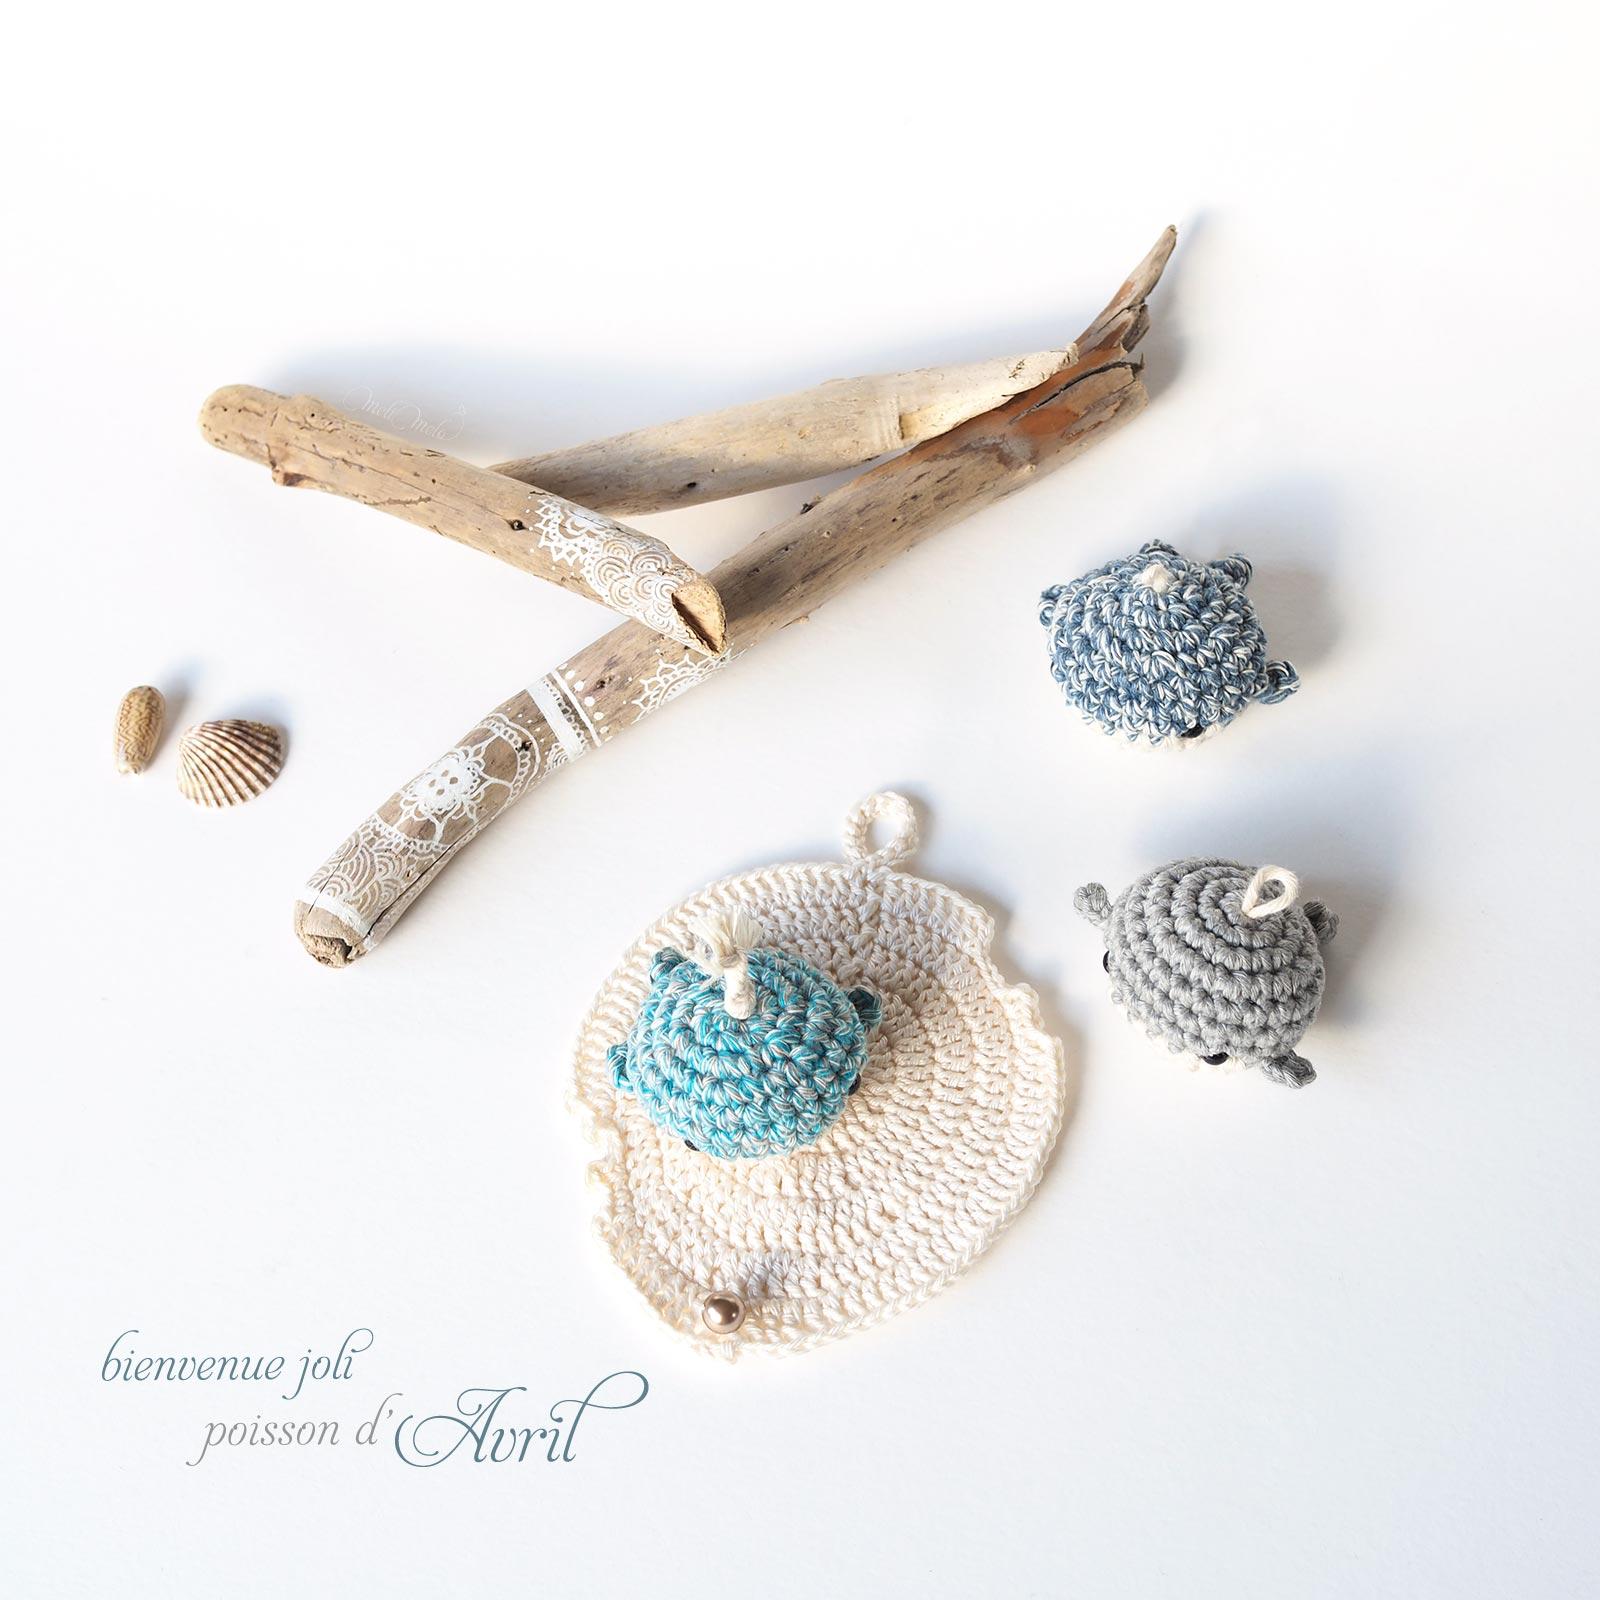 poisson d'avril crochet mini-baleines trio coquillage Swarovski pearl laboutiquedemelimelo